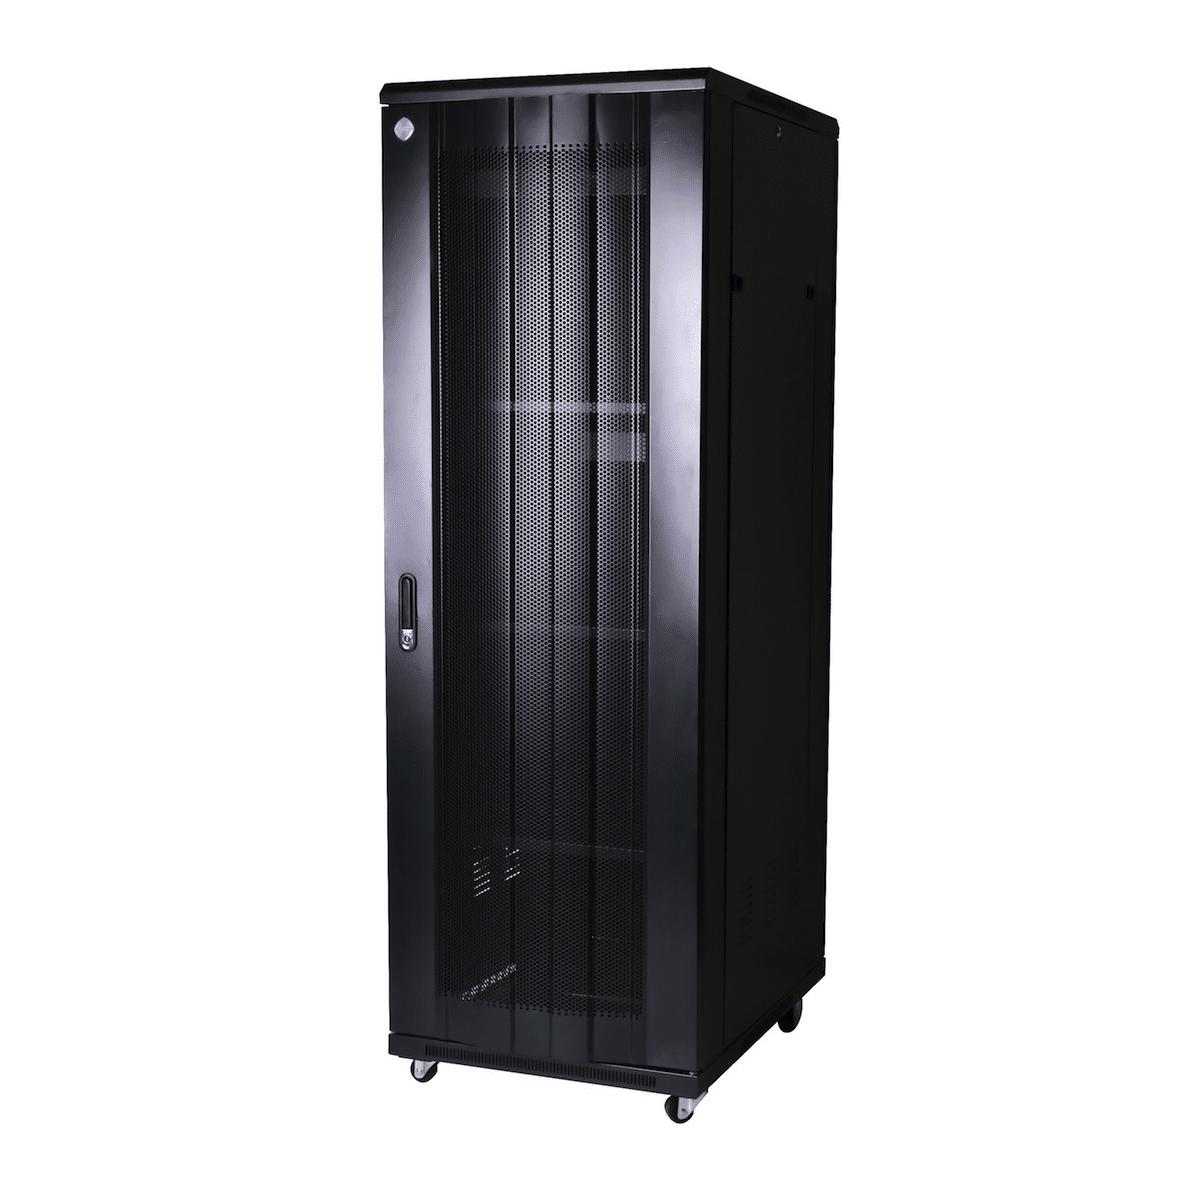 Curved 37RU 800mm Deep X 600mm Wide Rack Cabinet